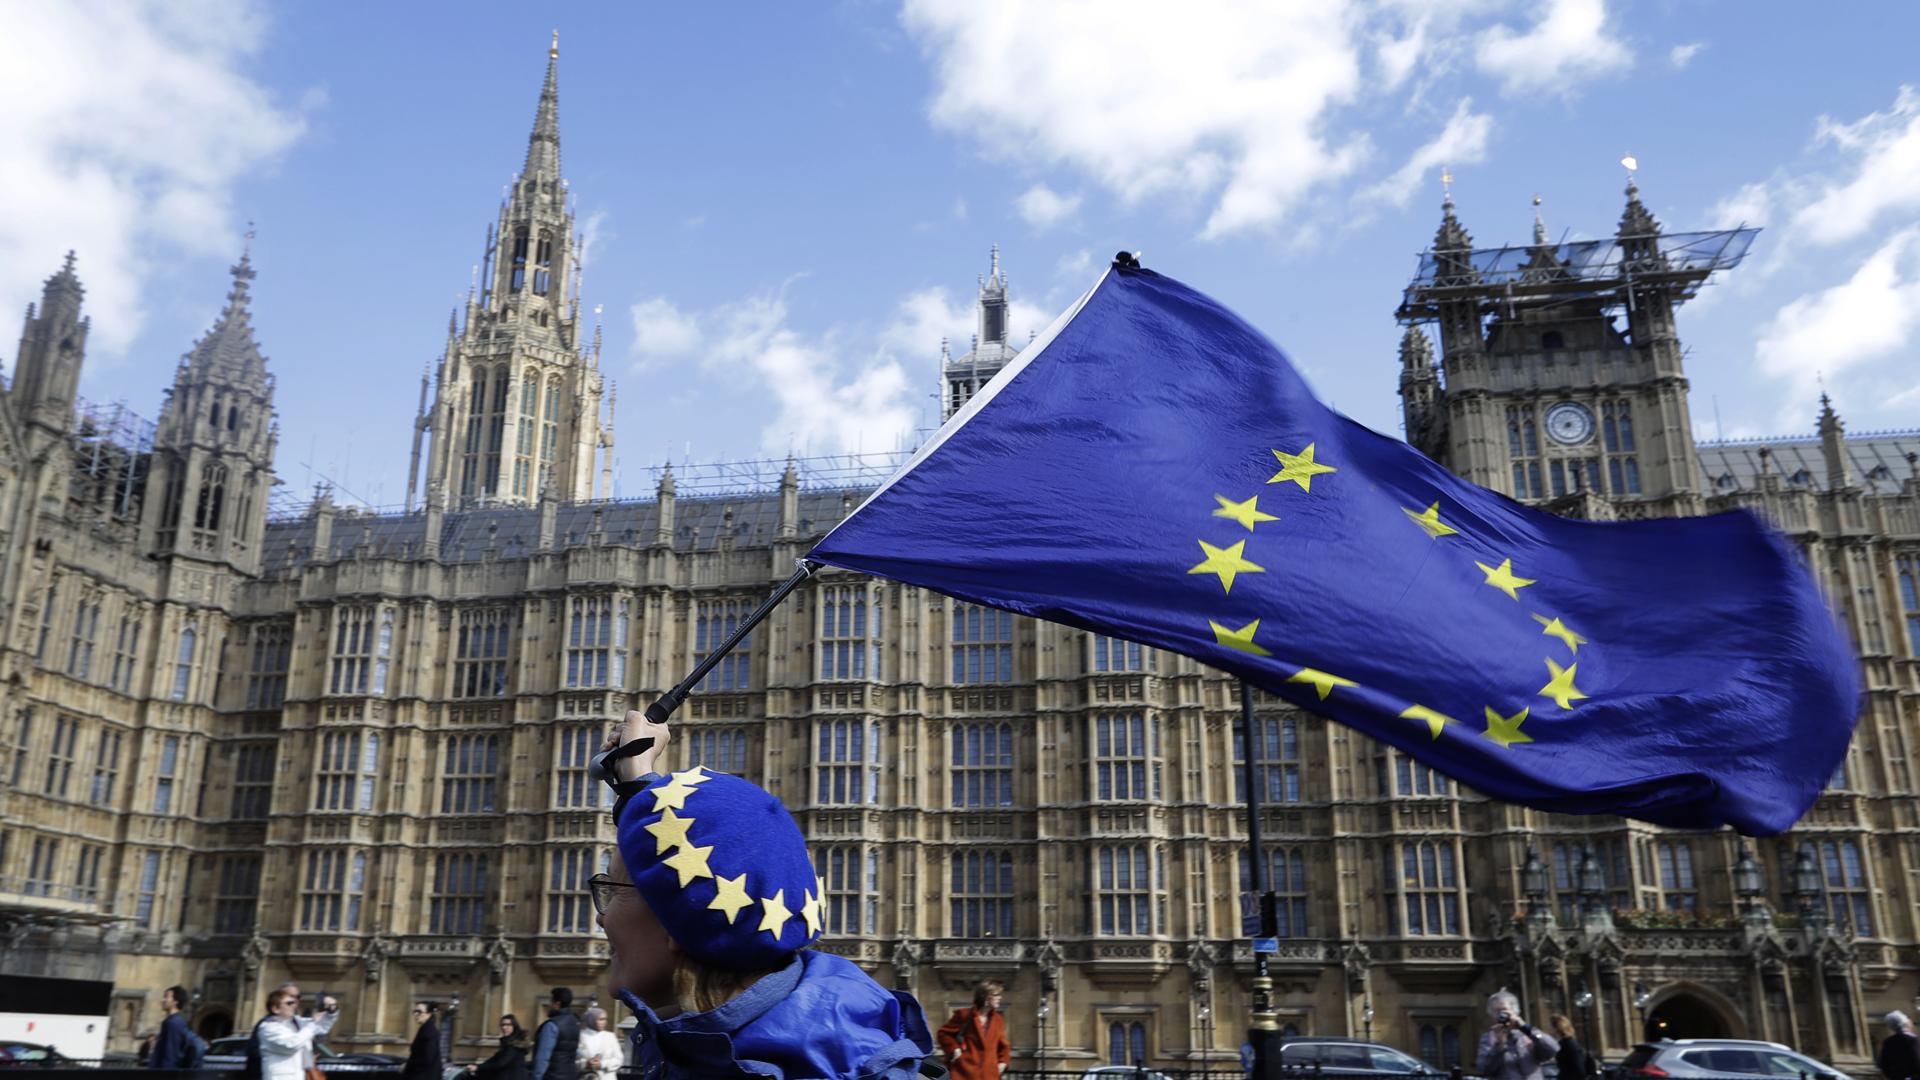 Brexit demonstrators 032519 AP_1553563714095